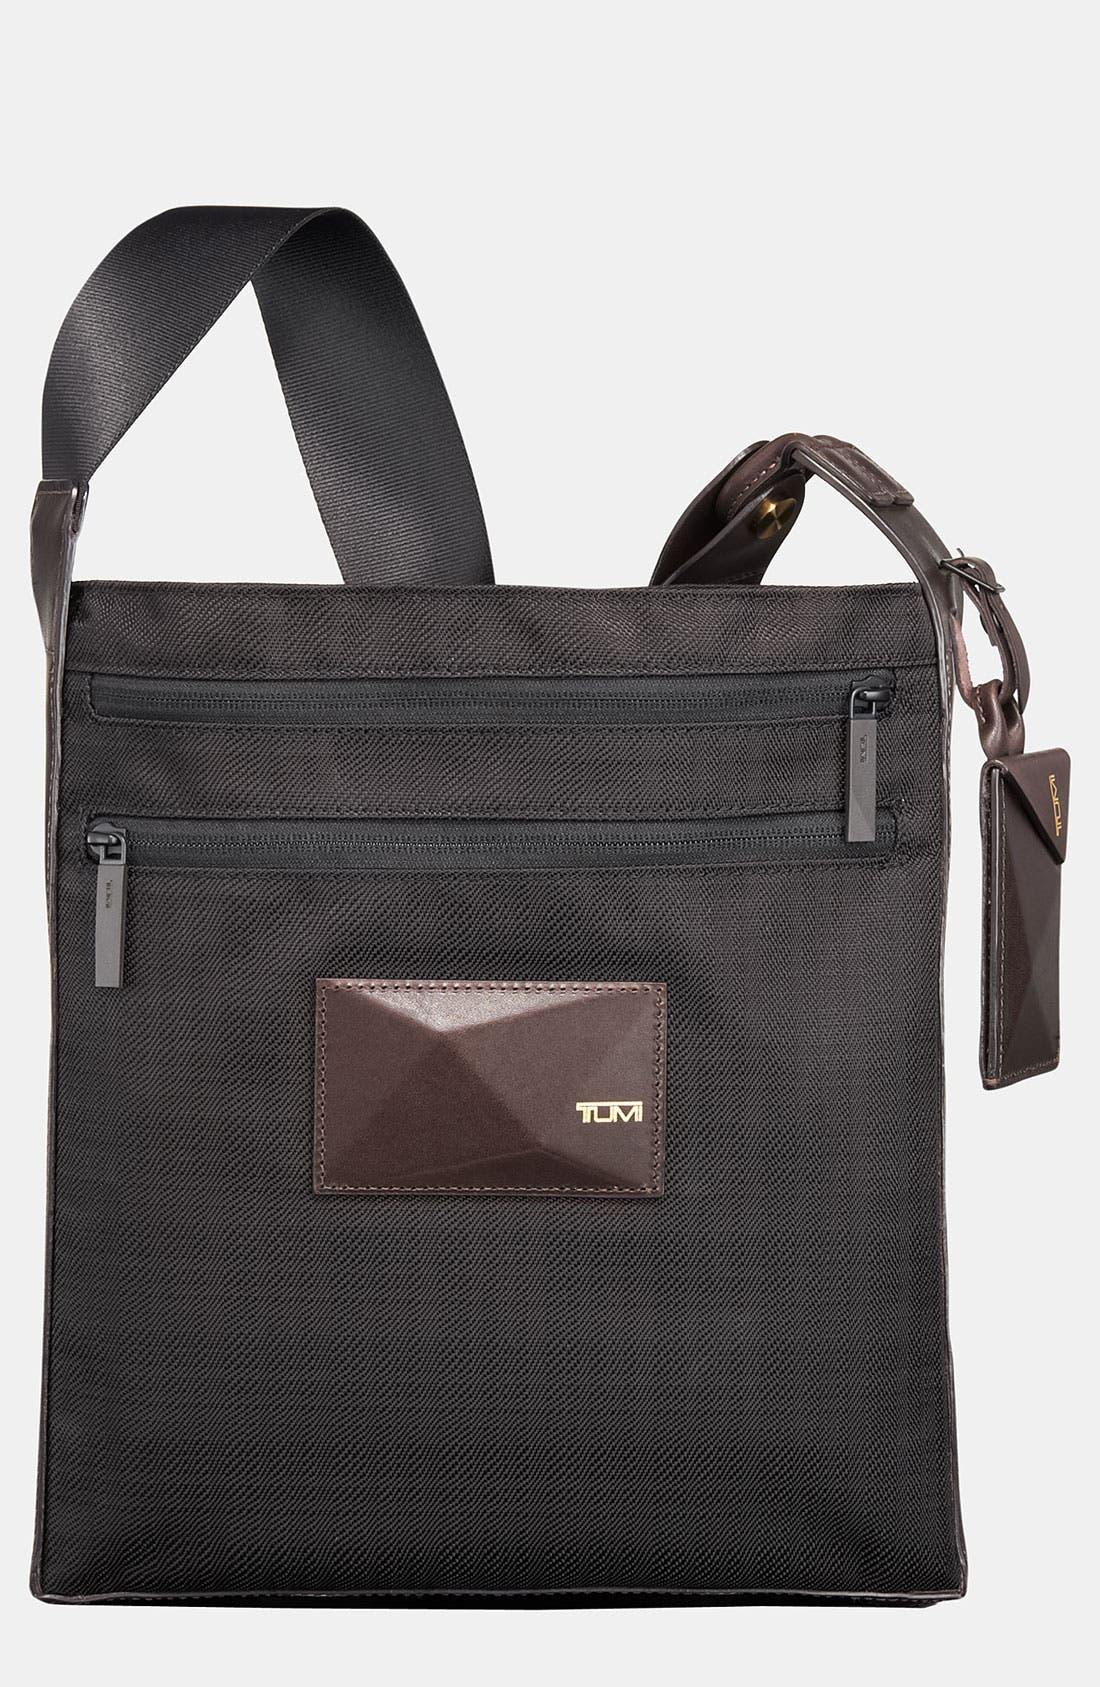 'Dror' Slim Crossbody Bag,                             Main thumbnail 1, color,                             207